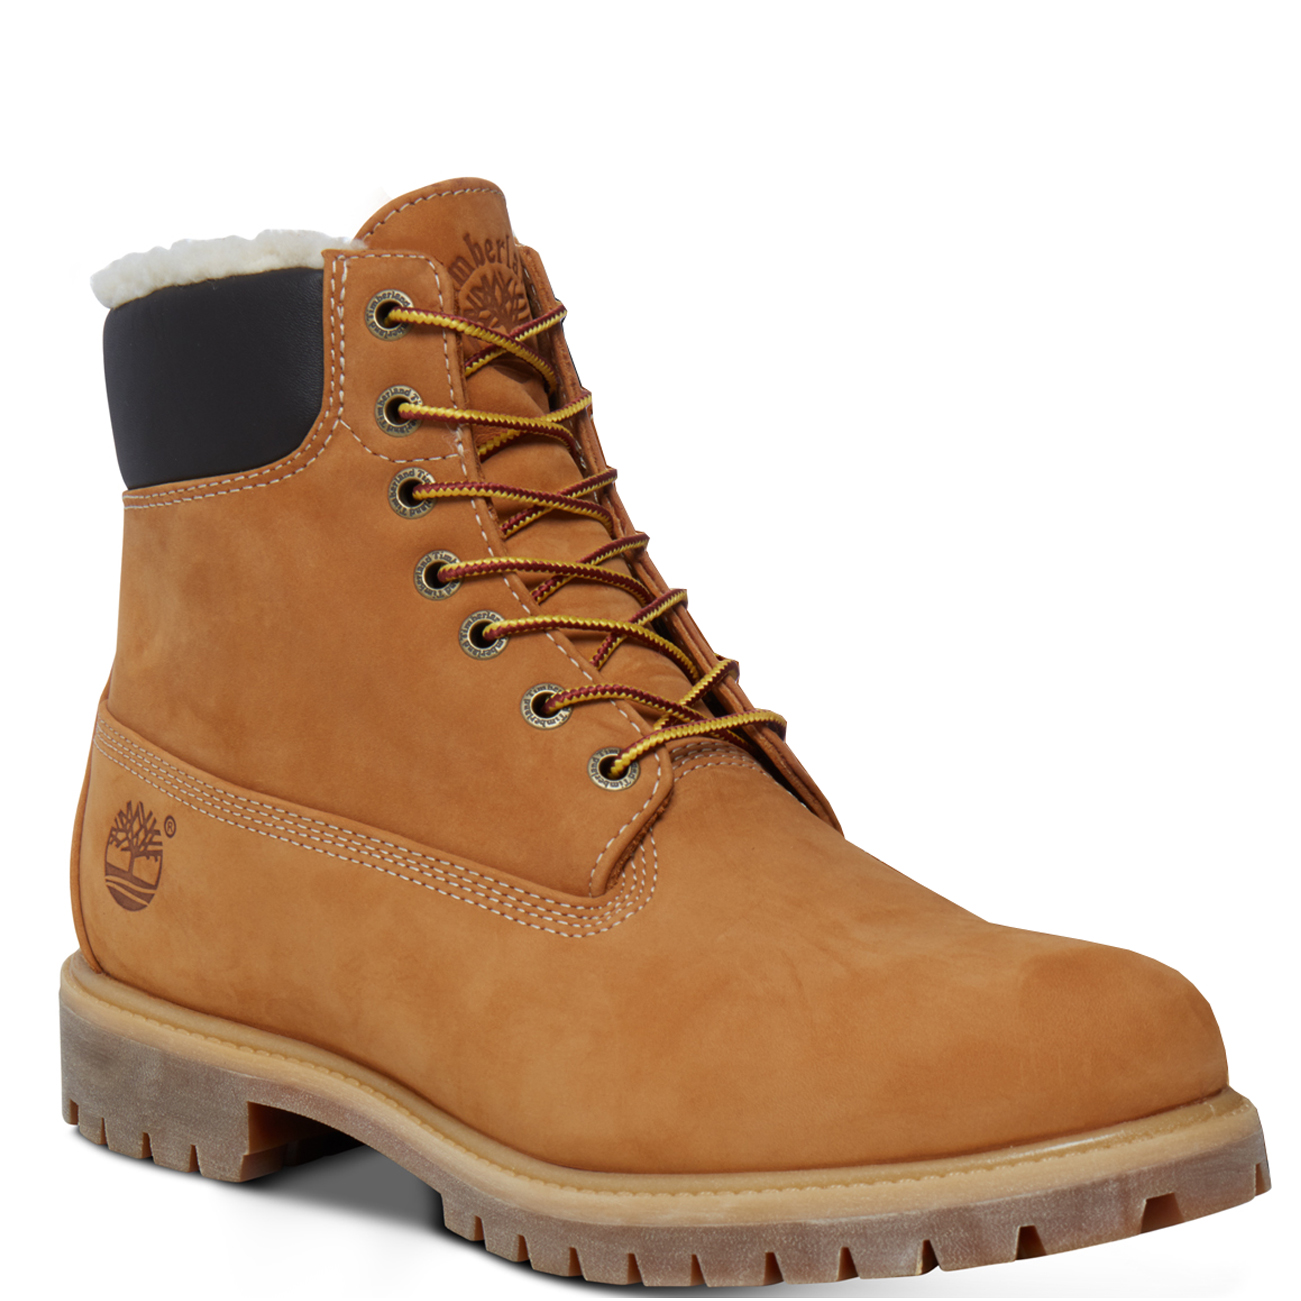 Timberland Premium Shearling 6 Inch Boot